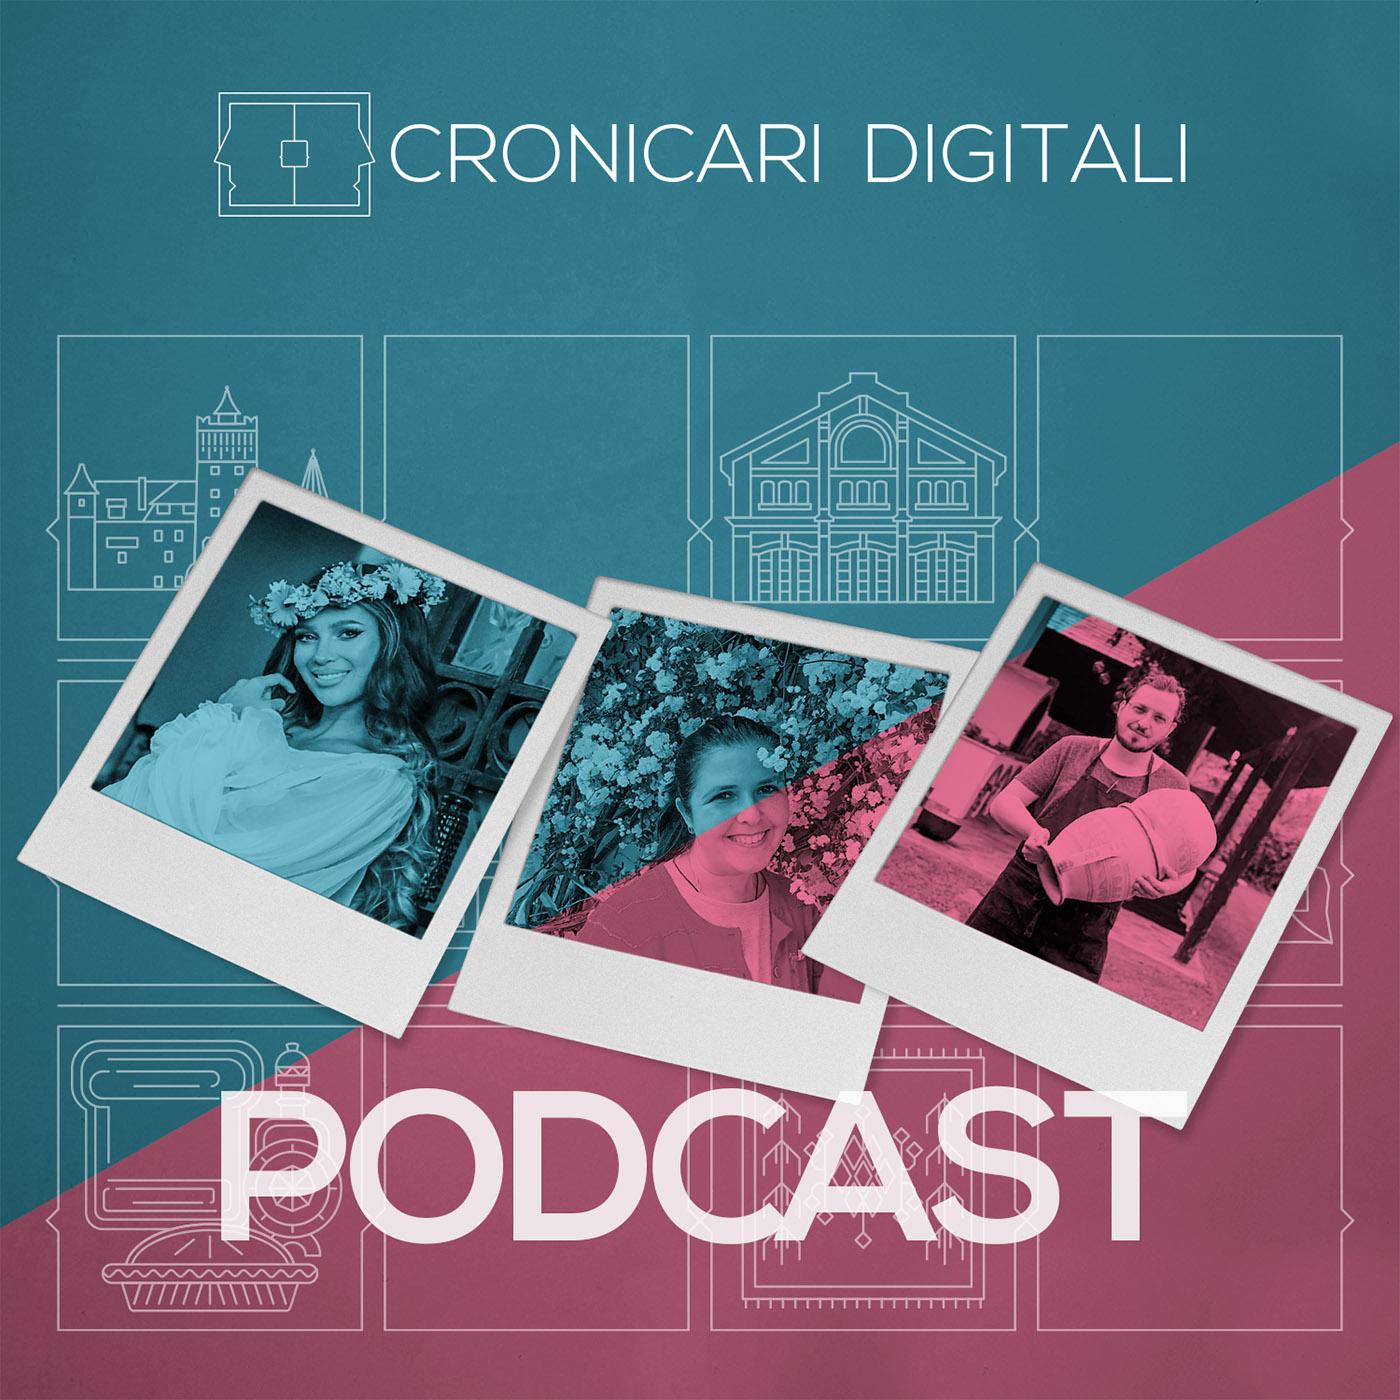 #cronicaridigitali S3 episod 10, Invitați Lora, Anita Sterea și Mihai Toader